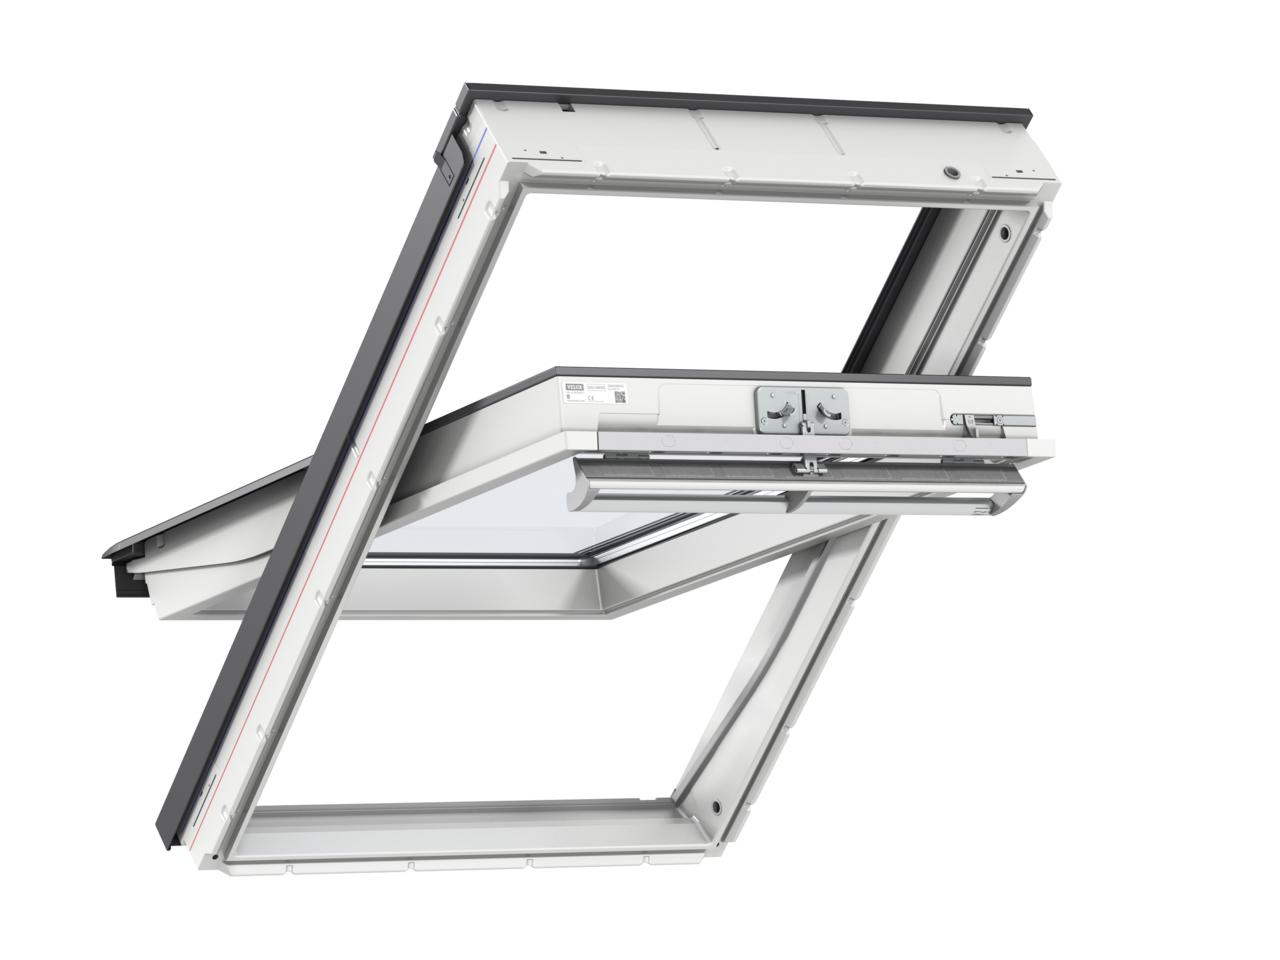 Velux GGU MK04 780 x 980mm Centre Pivot 34Pane Roof Window - White Polyurethane